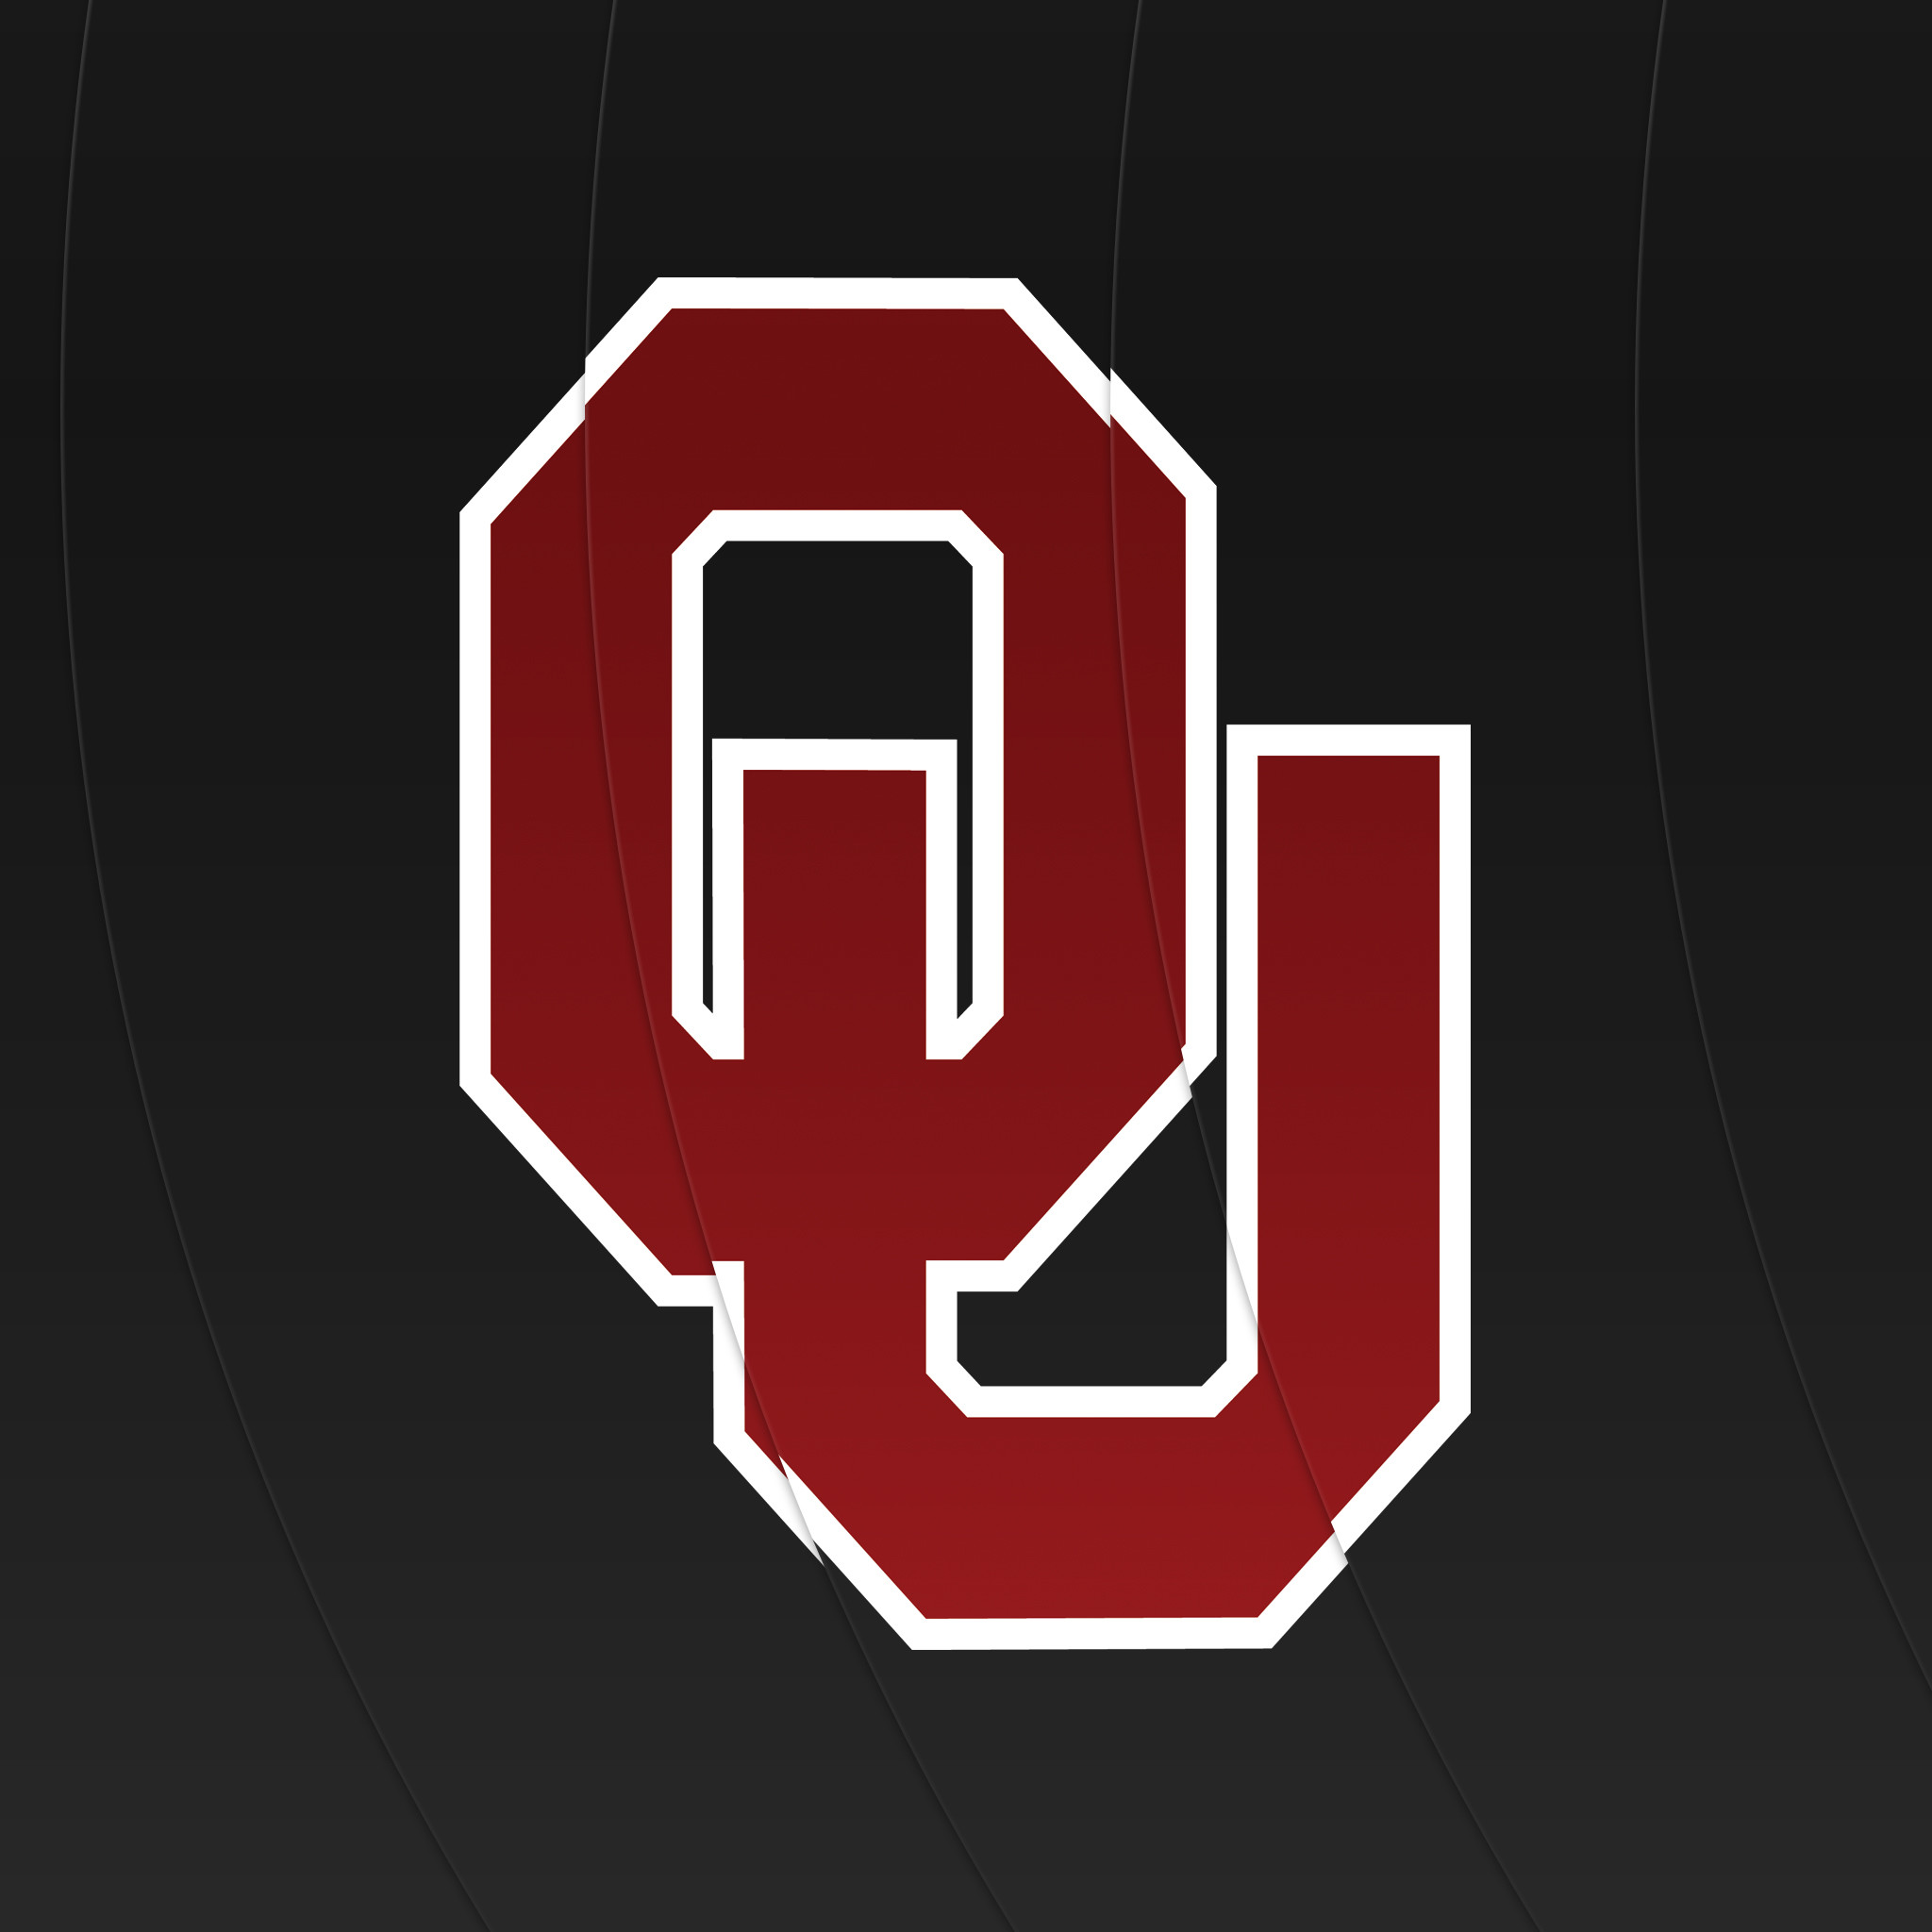 Oklahoma Sooners Wallpaper and Screensavers (66+ images)